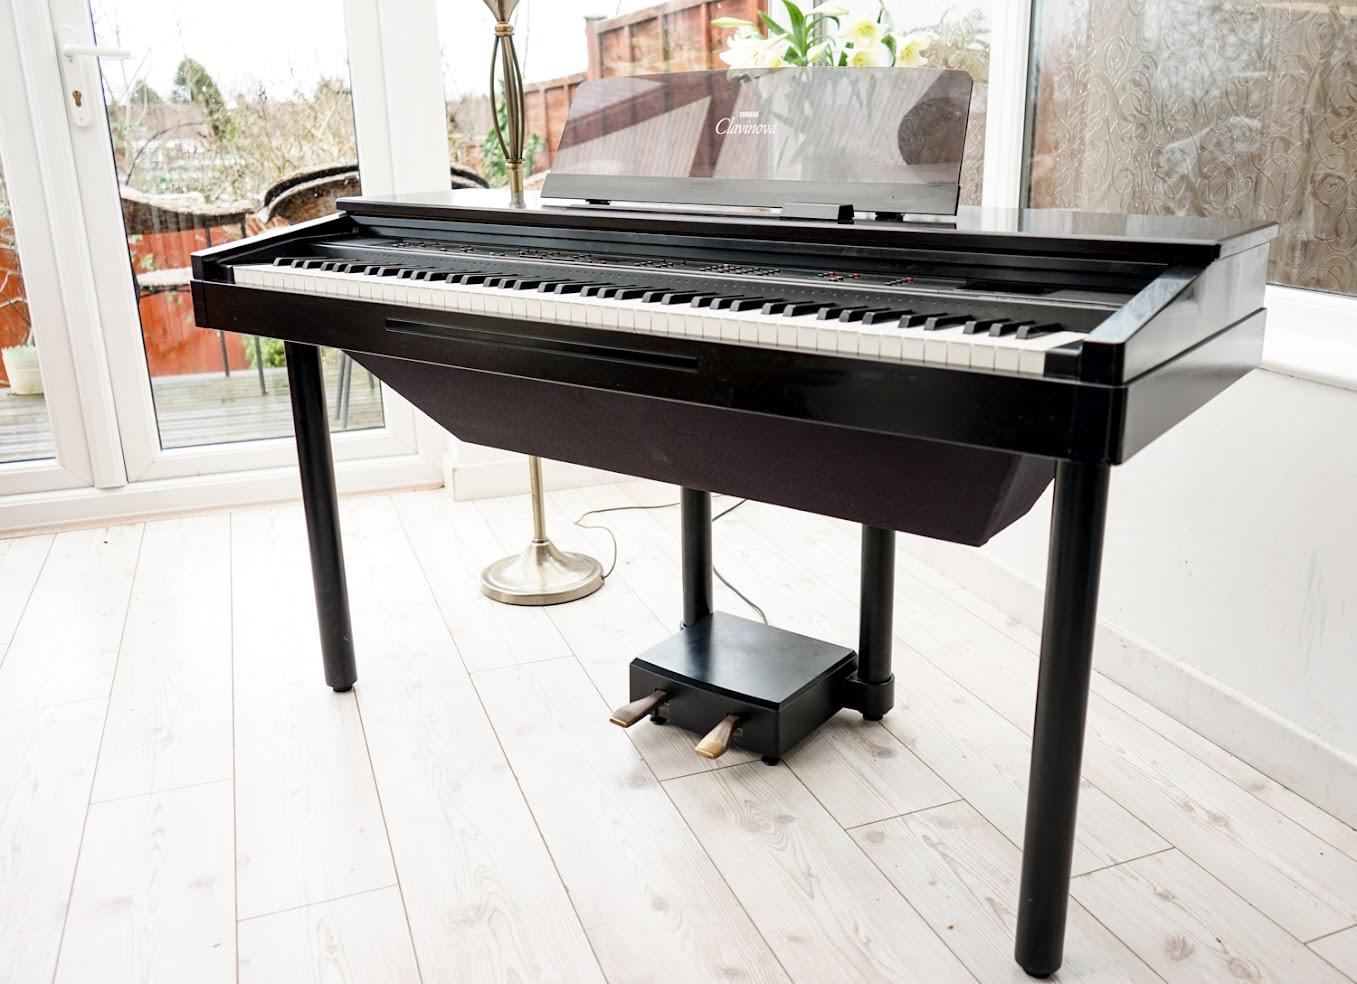 Yamaha clavinova digital full size baby grand piano 88 key for Yamaha baby grand piano dimensions